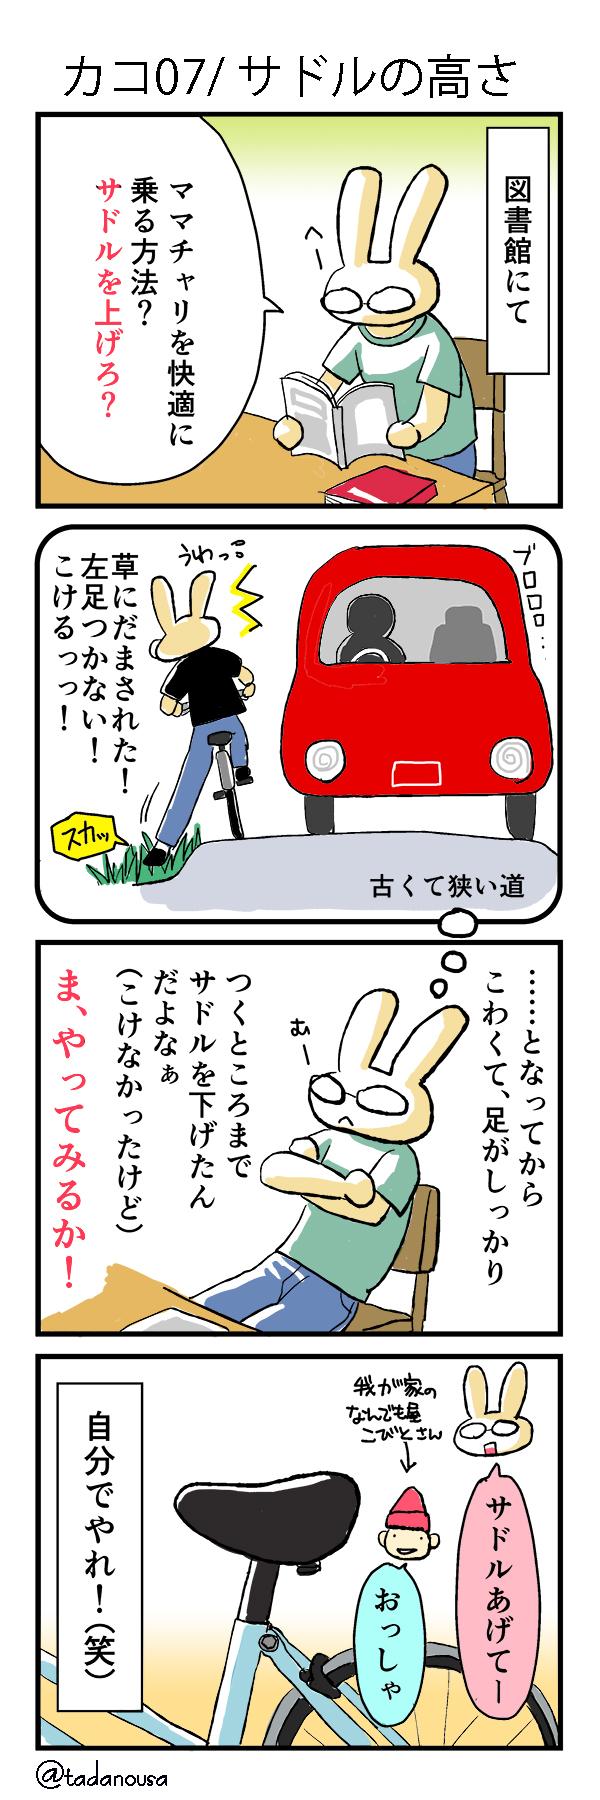 bike_4koma_kako007_s.jpg